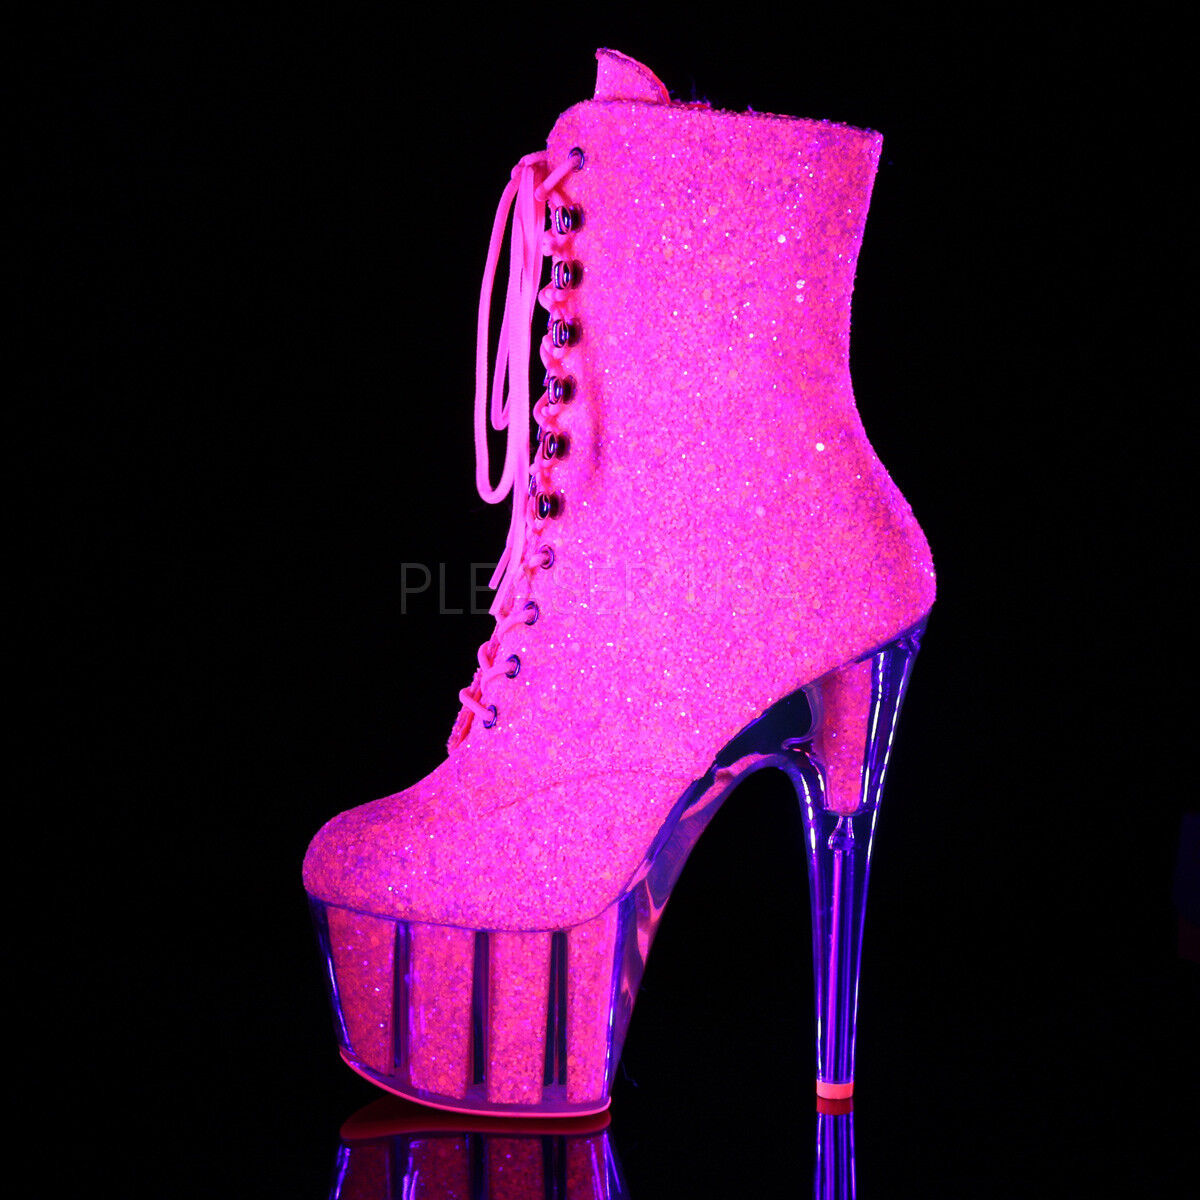 7 Stripper  Heel Neon Rosa Glitter Platform Stripper 7 Stiefel Pole Dance schuhe Pleaser 65f5e8